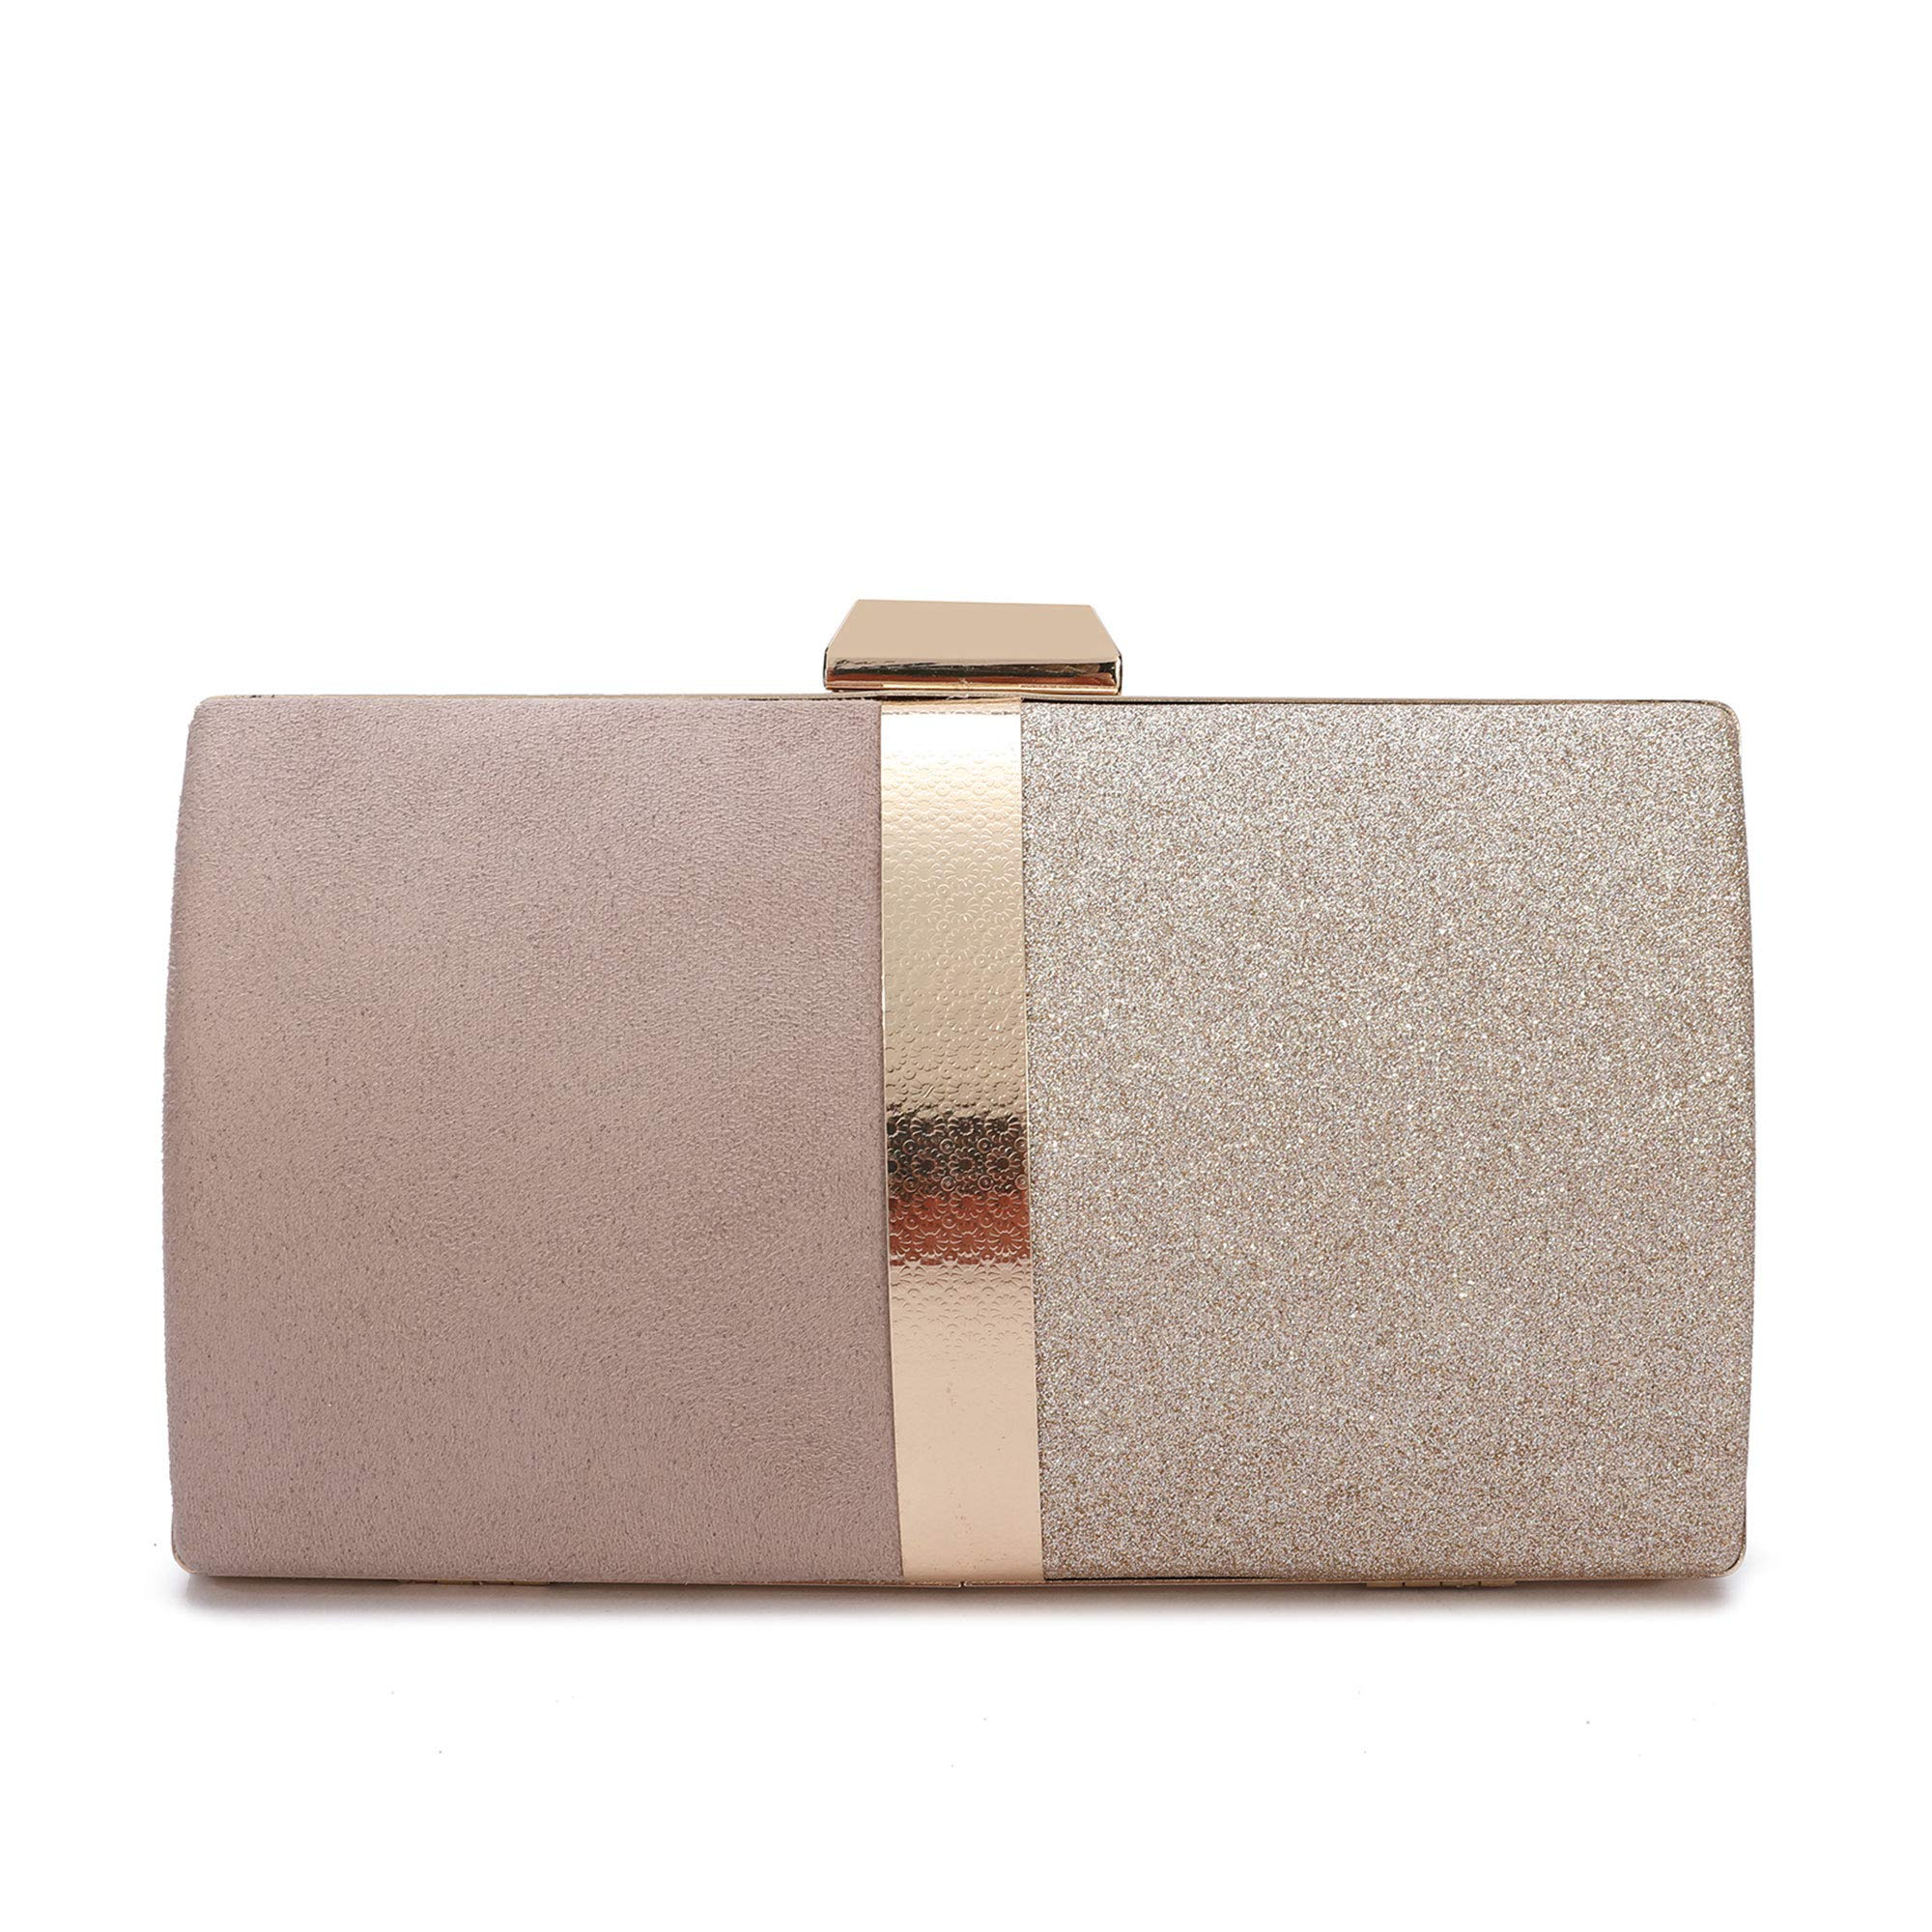 Womens Glitter Clutch Purse Sparkling Evening Bags Crystal Evening Handbag Shoulder Crossbody Bag for Wedding Party Prom Bride